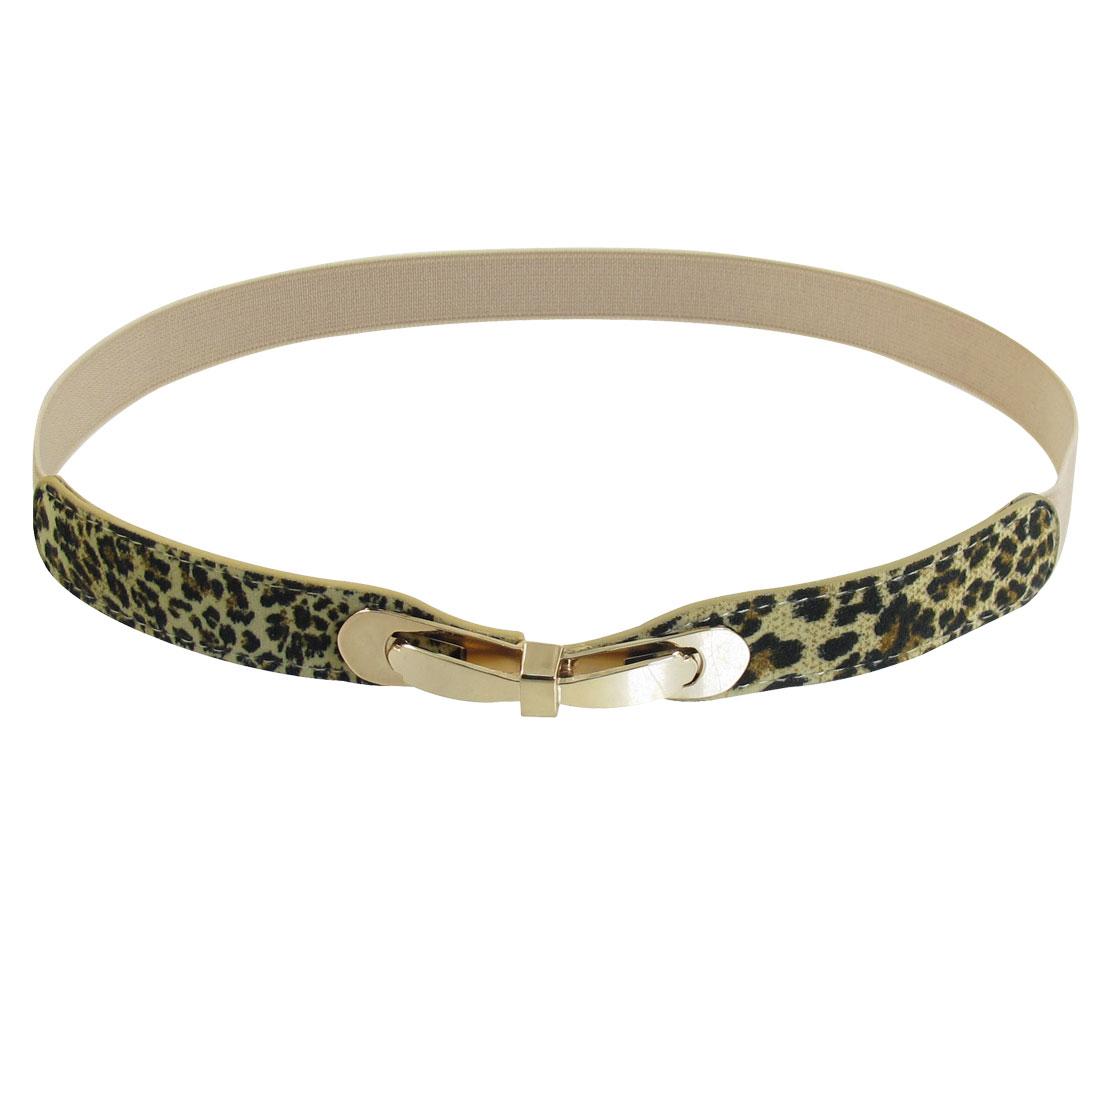 Gray Metal Interlocking Buckle Leopard Elastic Slim Cinch Waist Belt